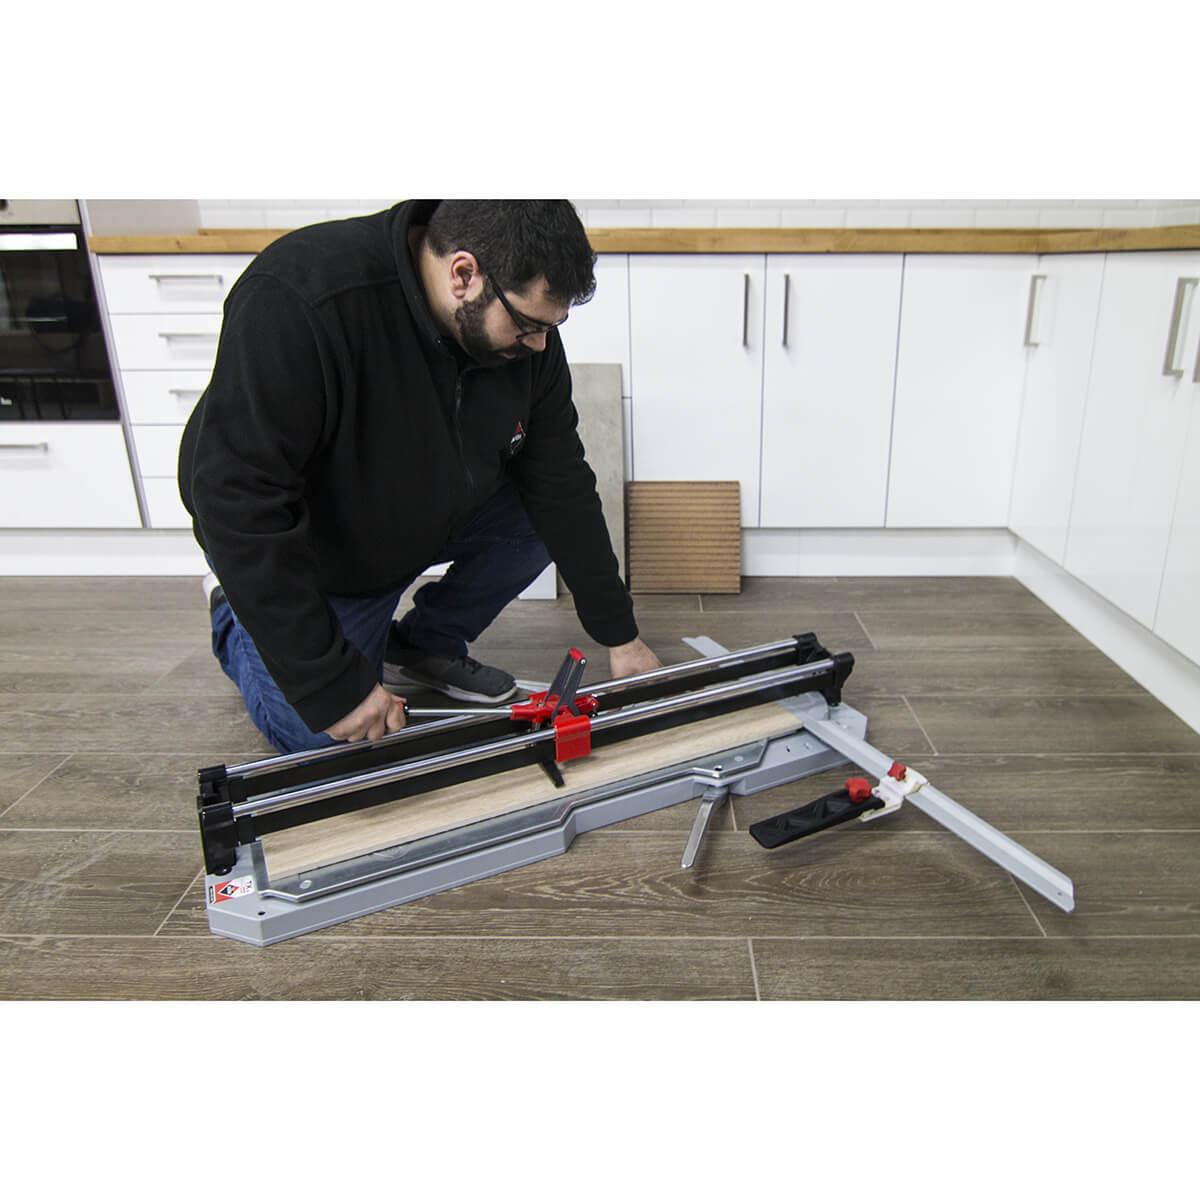 cutting tile with rubi tx-n cutter